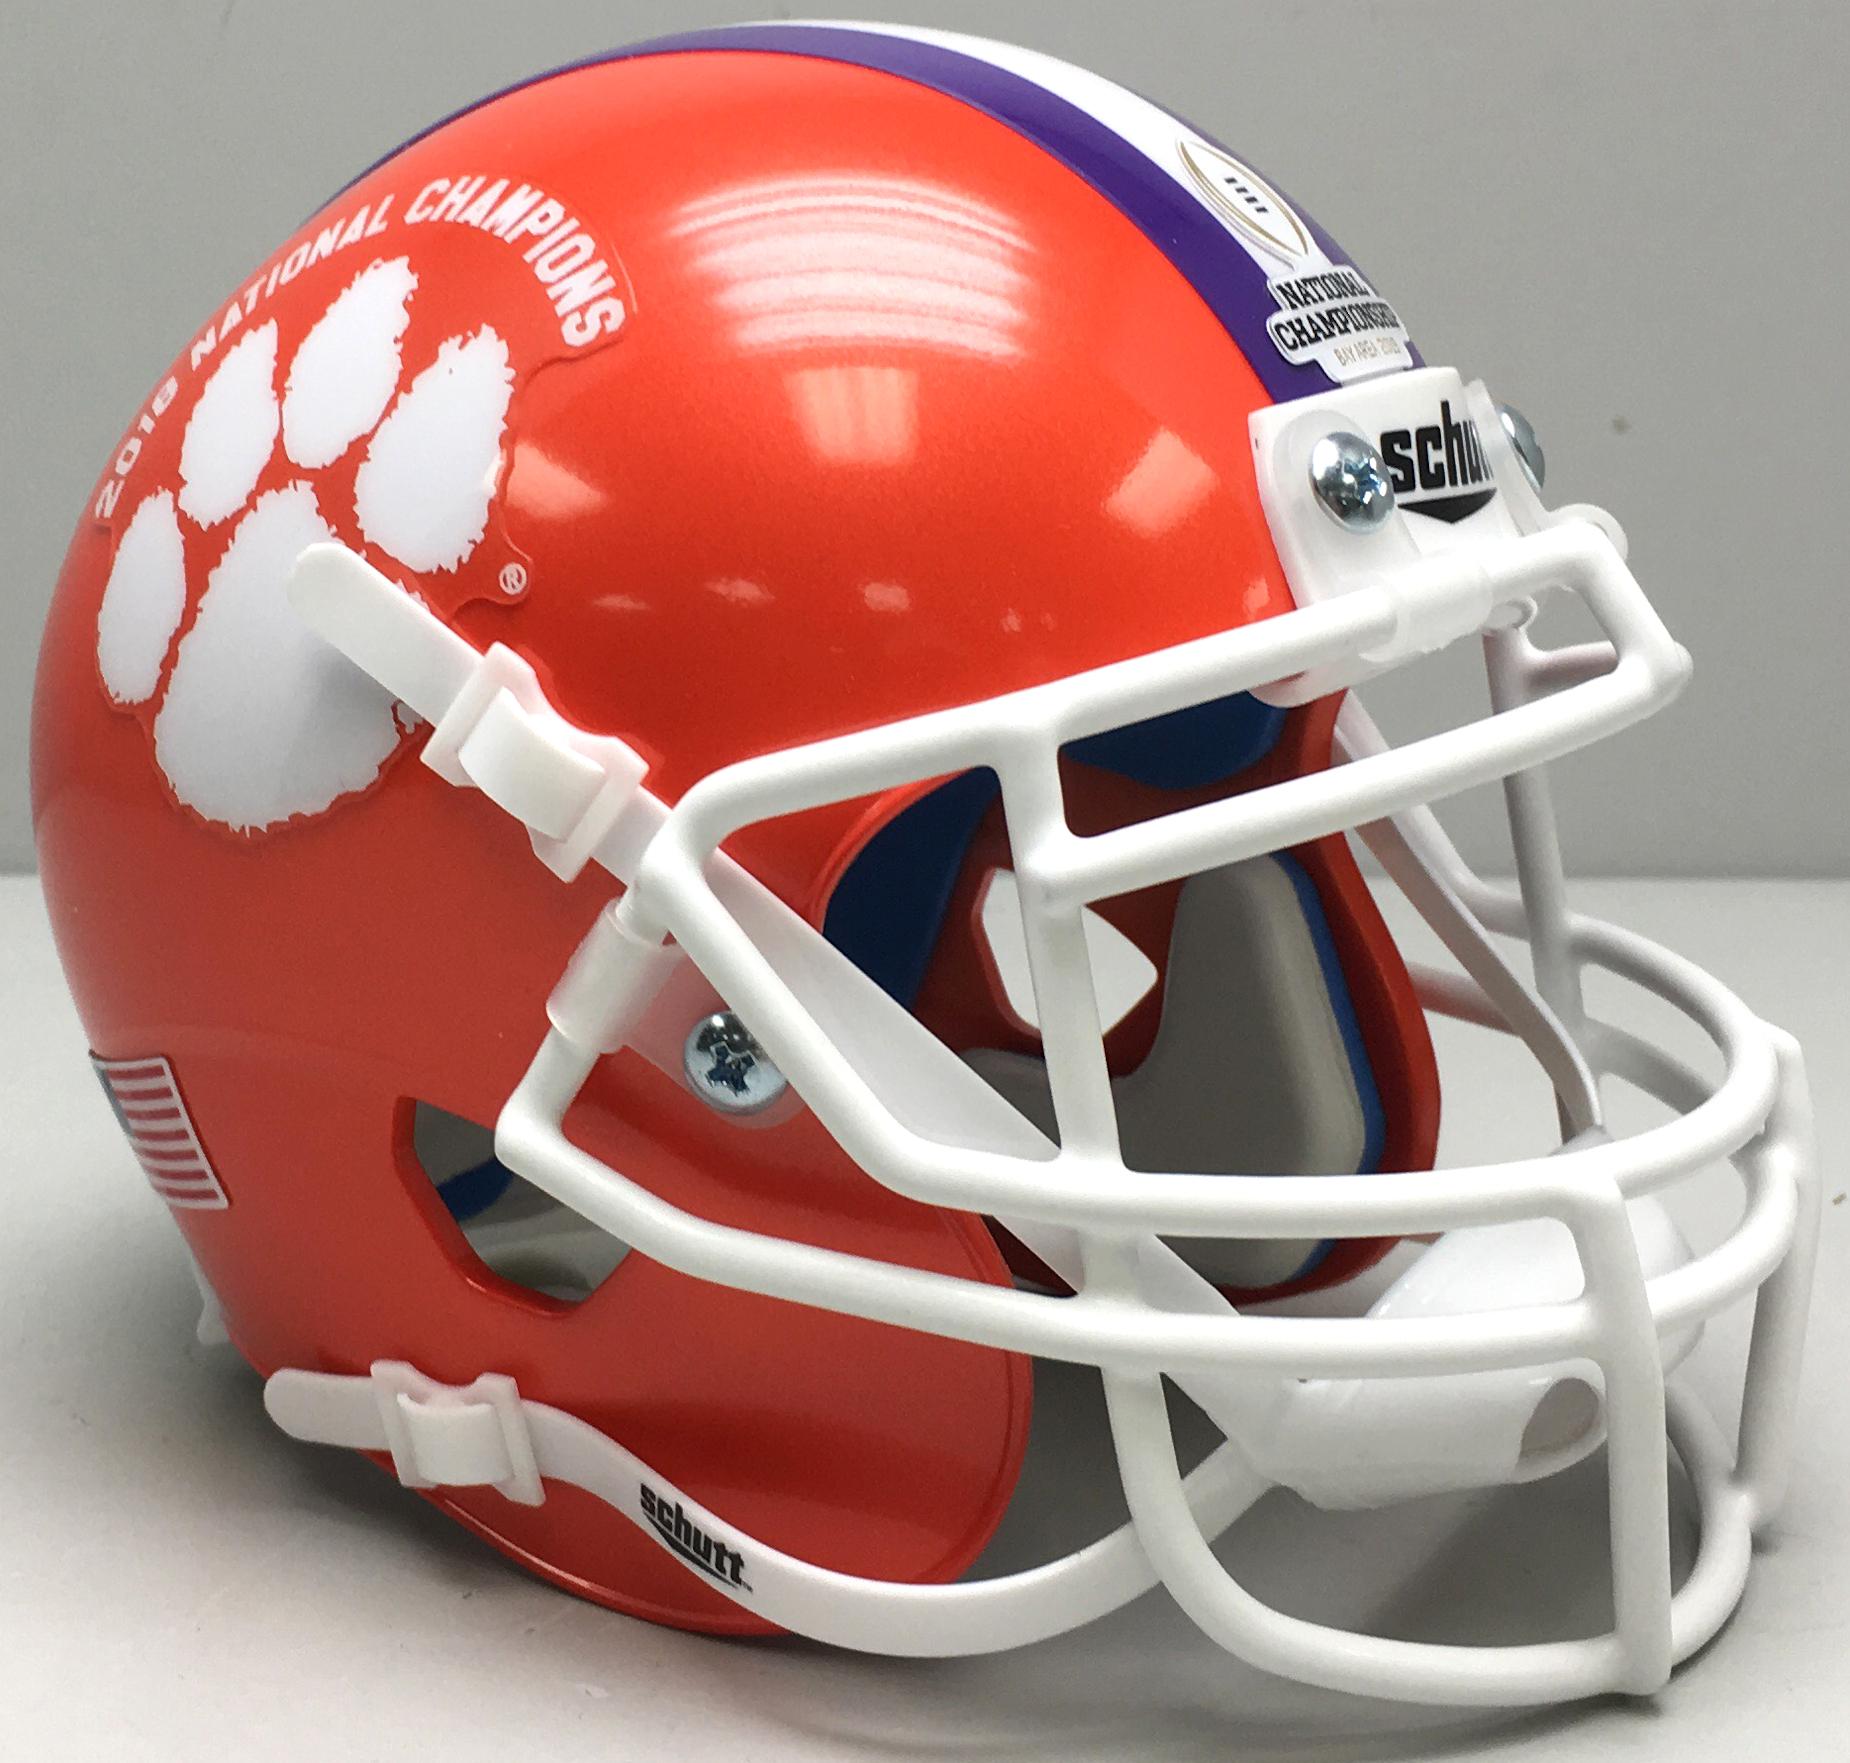 Clemson Tigers Authentic College XP Football Helmet Schutt <B>2018 National Champions</B>